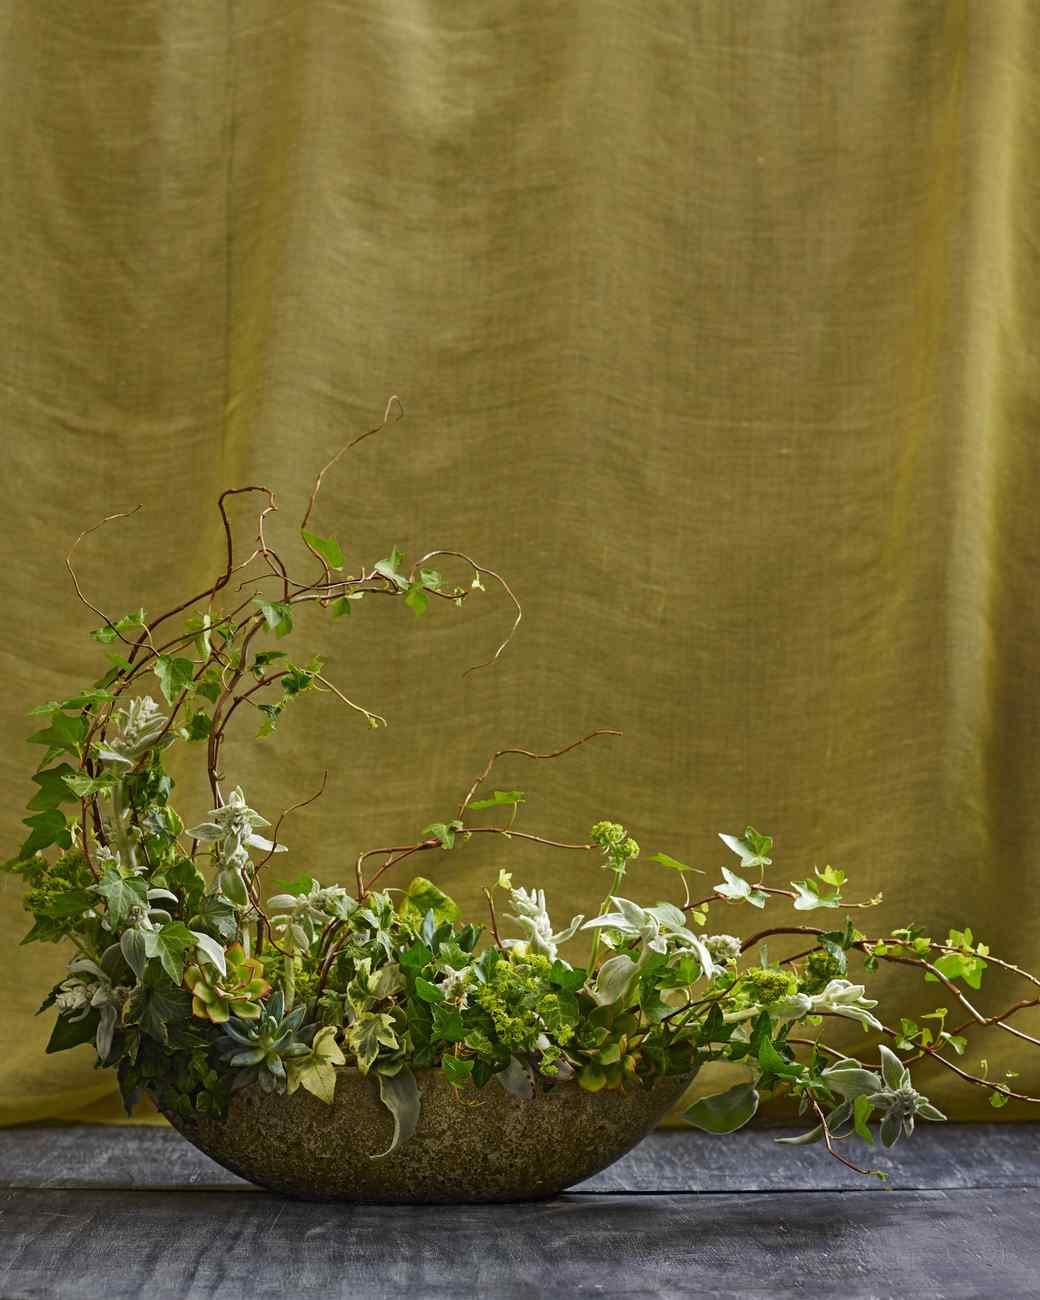 dandelion-ranch-clover-chadwick-green-236-d112251.jpg